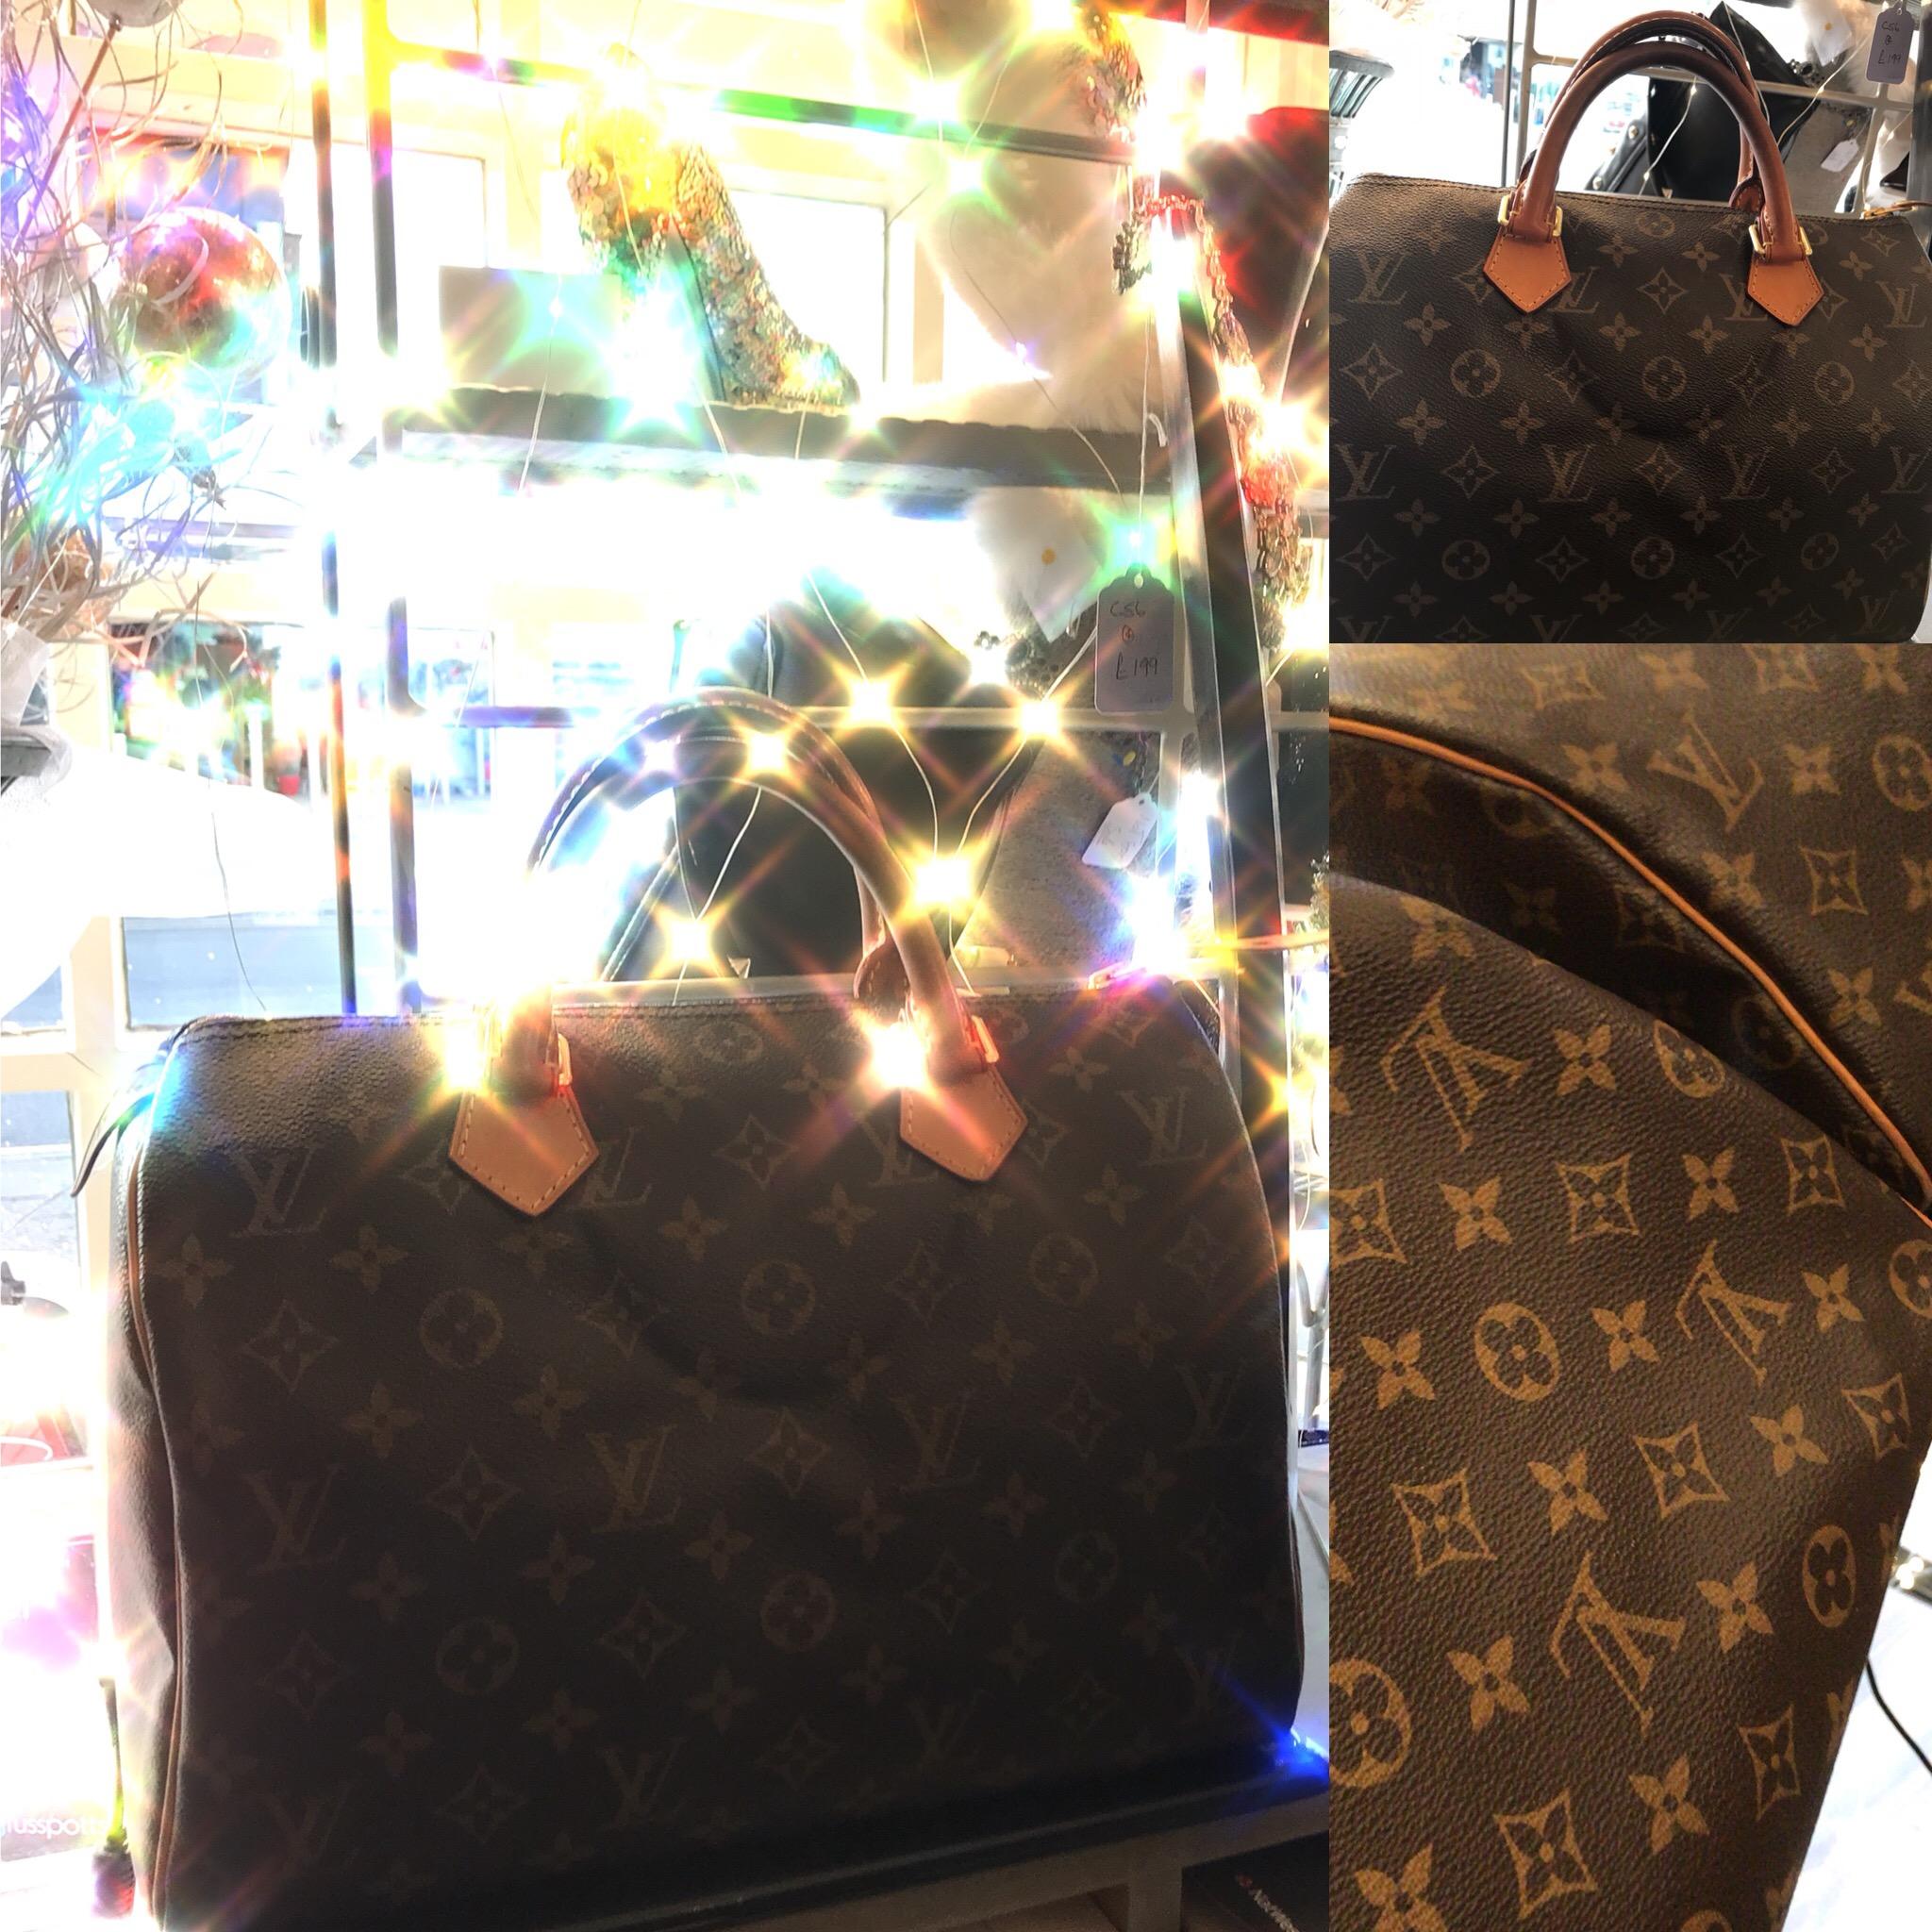 Louis Vuitton Speedy 30 bag in monogram £499.JPG